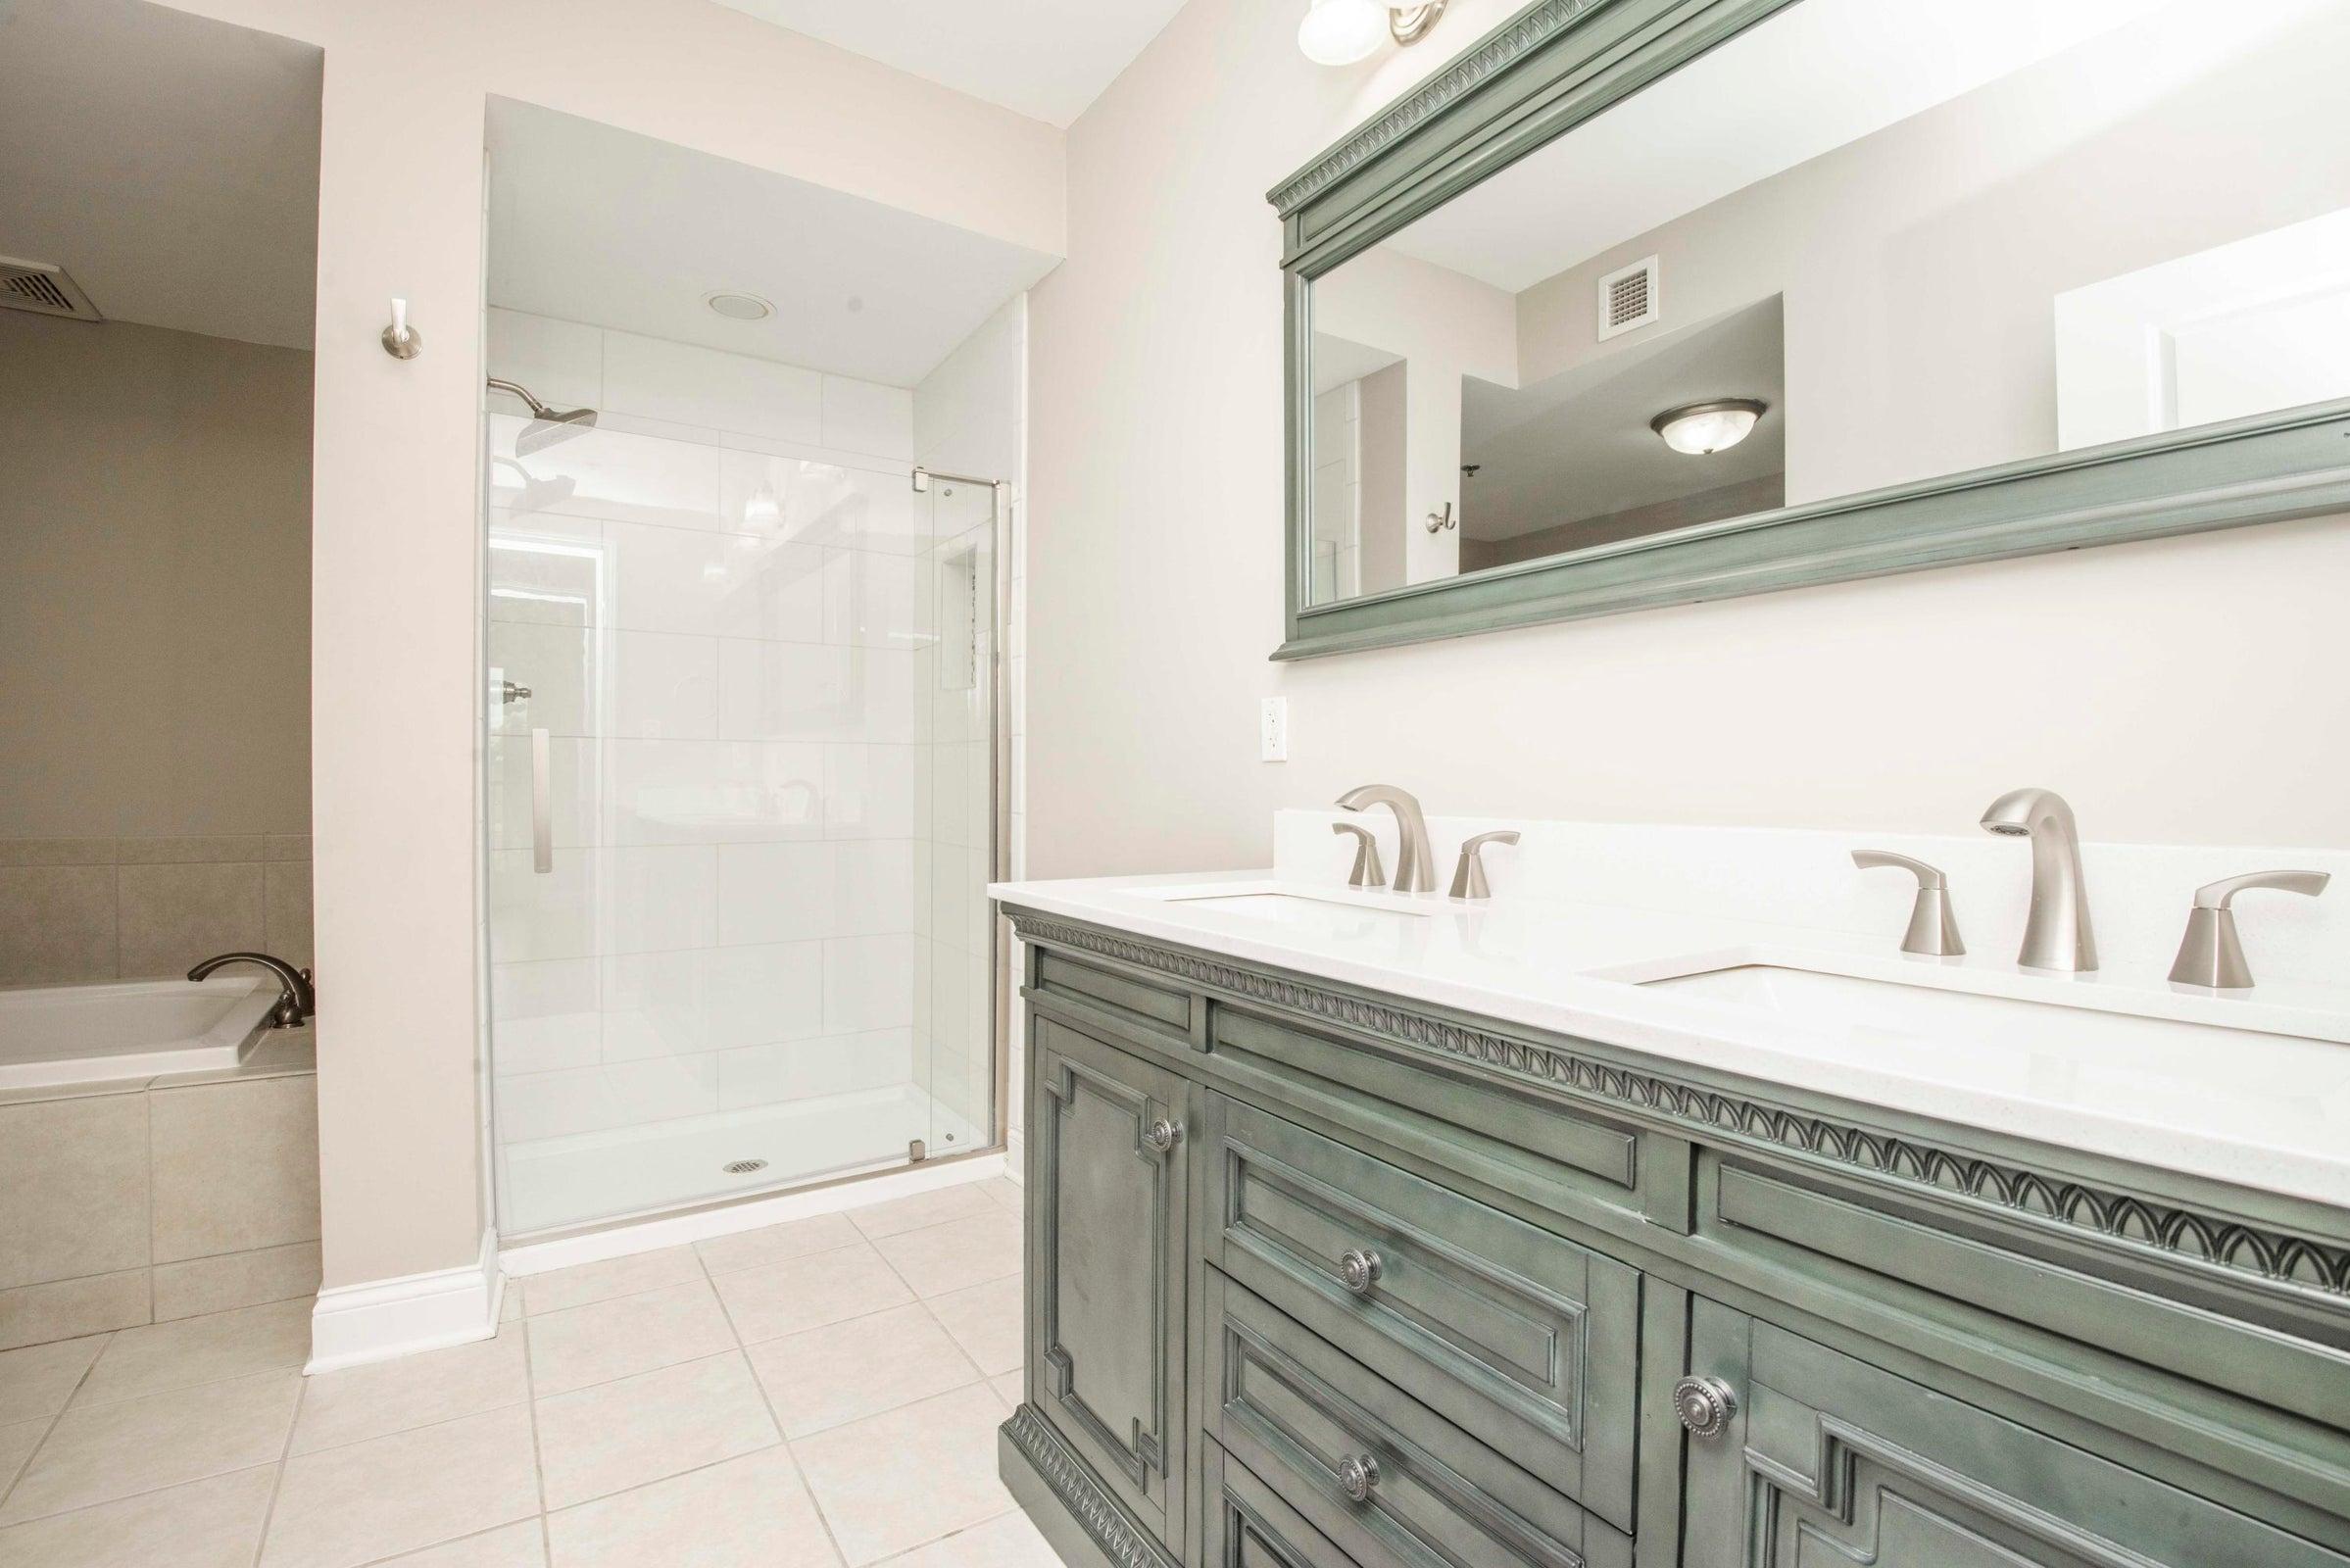 Renovated Ma Bathroom